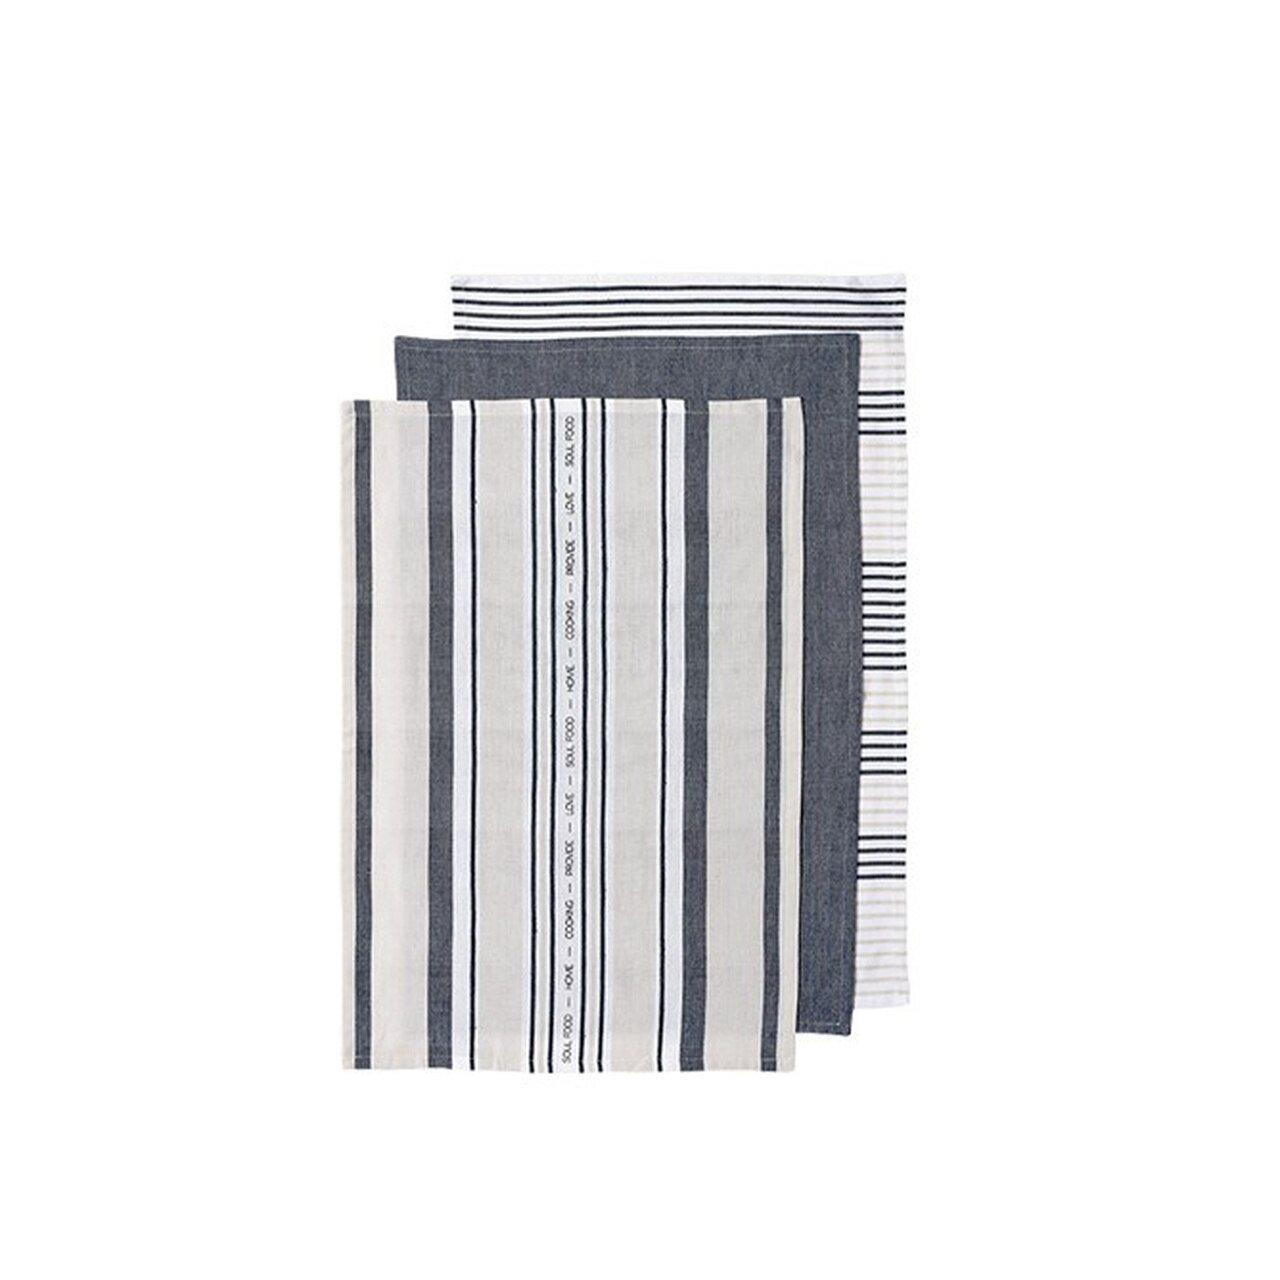 Ladelle Πετσέτες Κουζίνας Βαμβακερές Μπλε Abode Stripe 45X70cm- Σετ 3 Τεμάχια